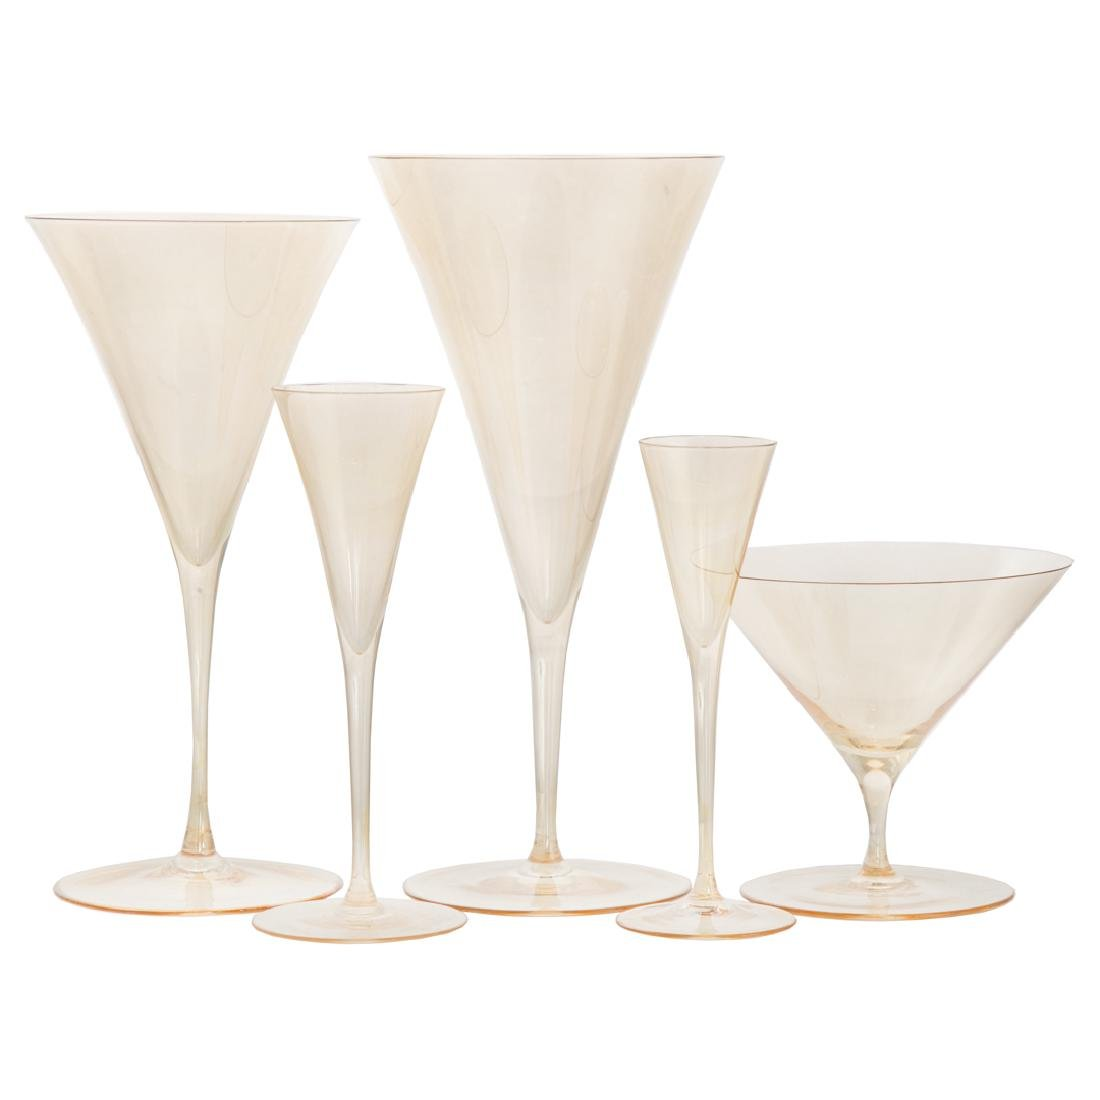 Lobmeyr Ambassador gold lustre glassware